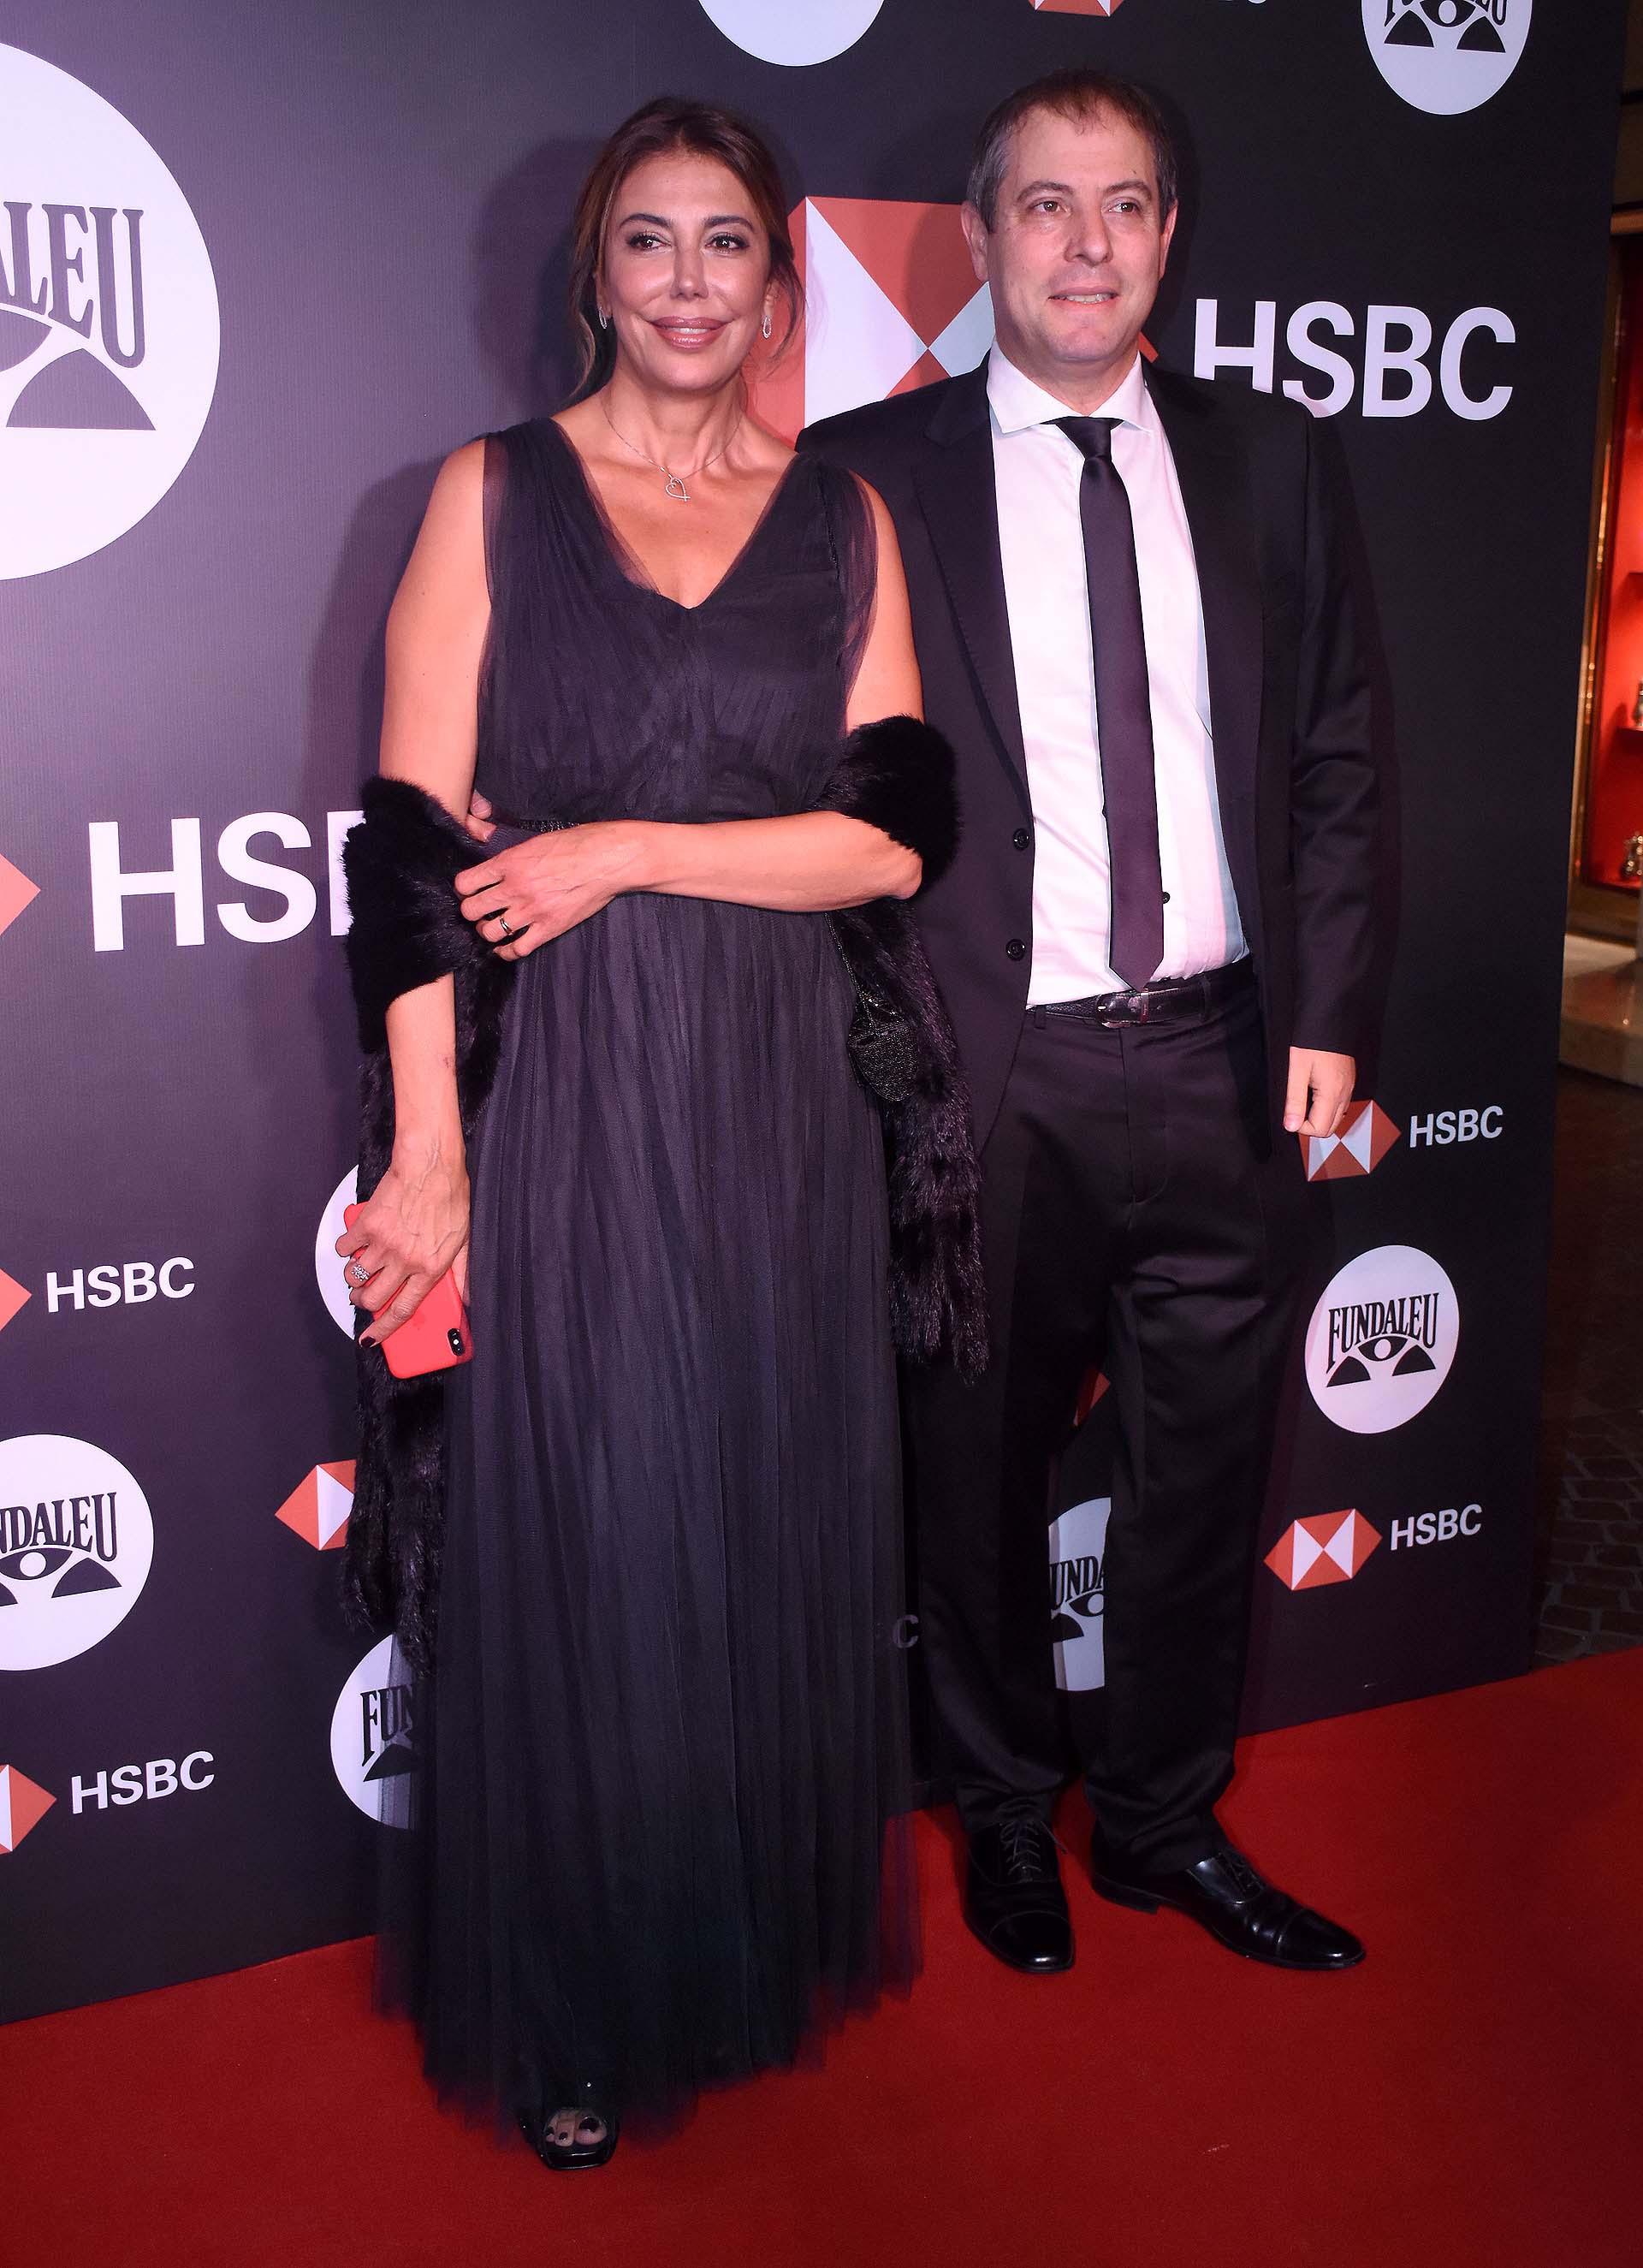 La médica Griselda Seleme y su marido Marcelo Perinotti